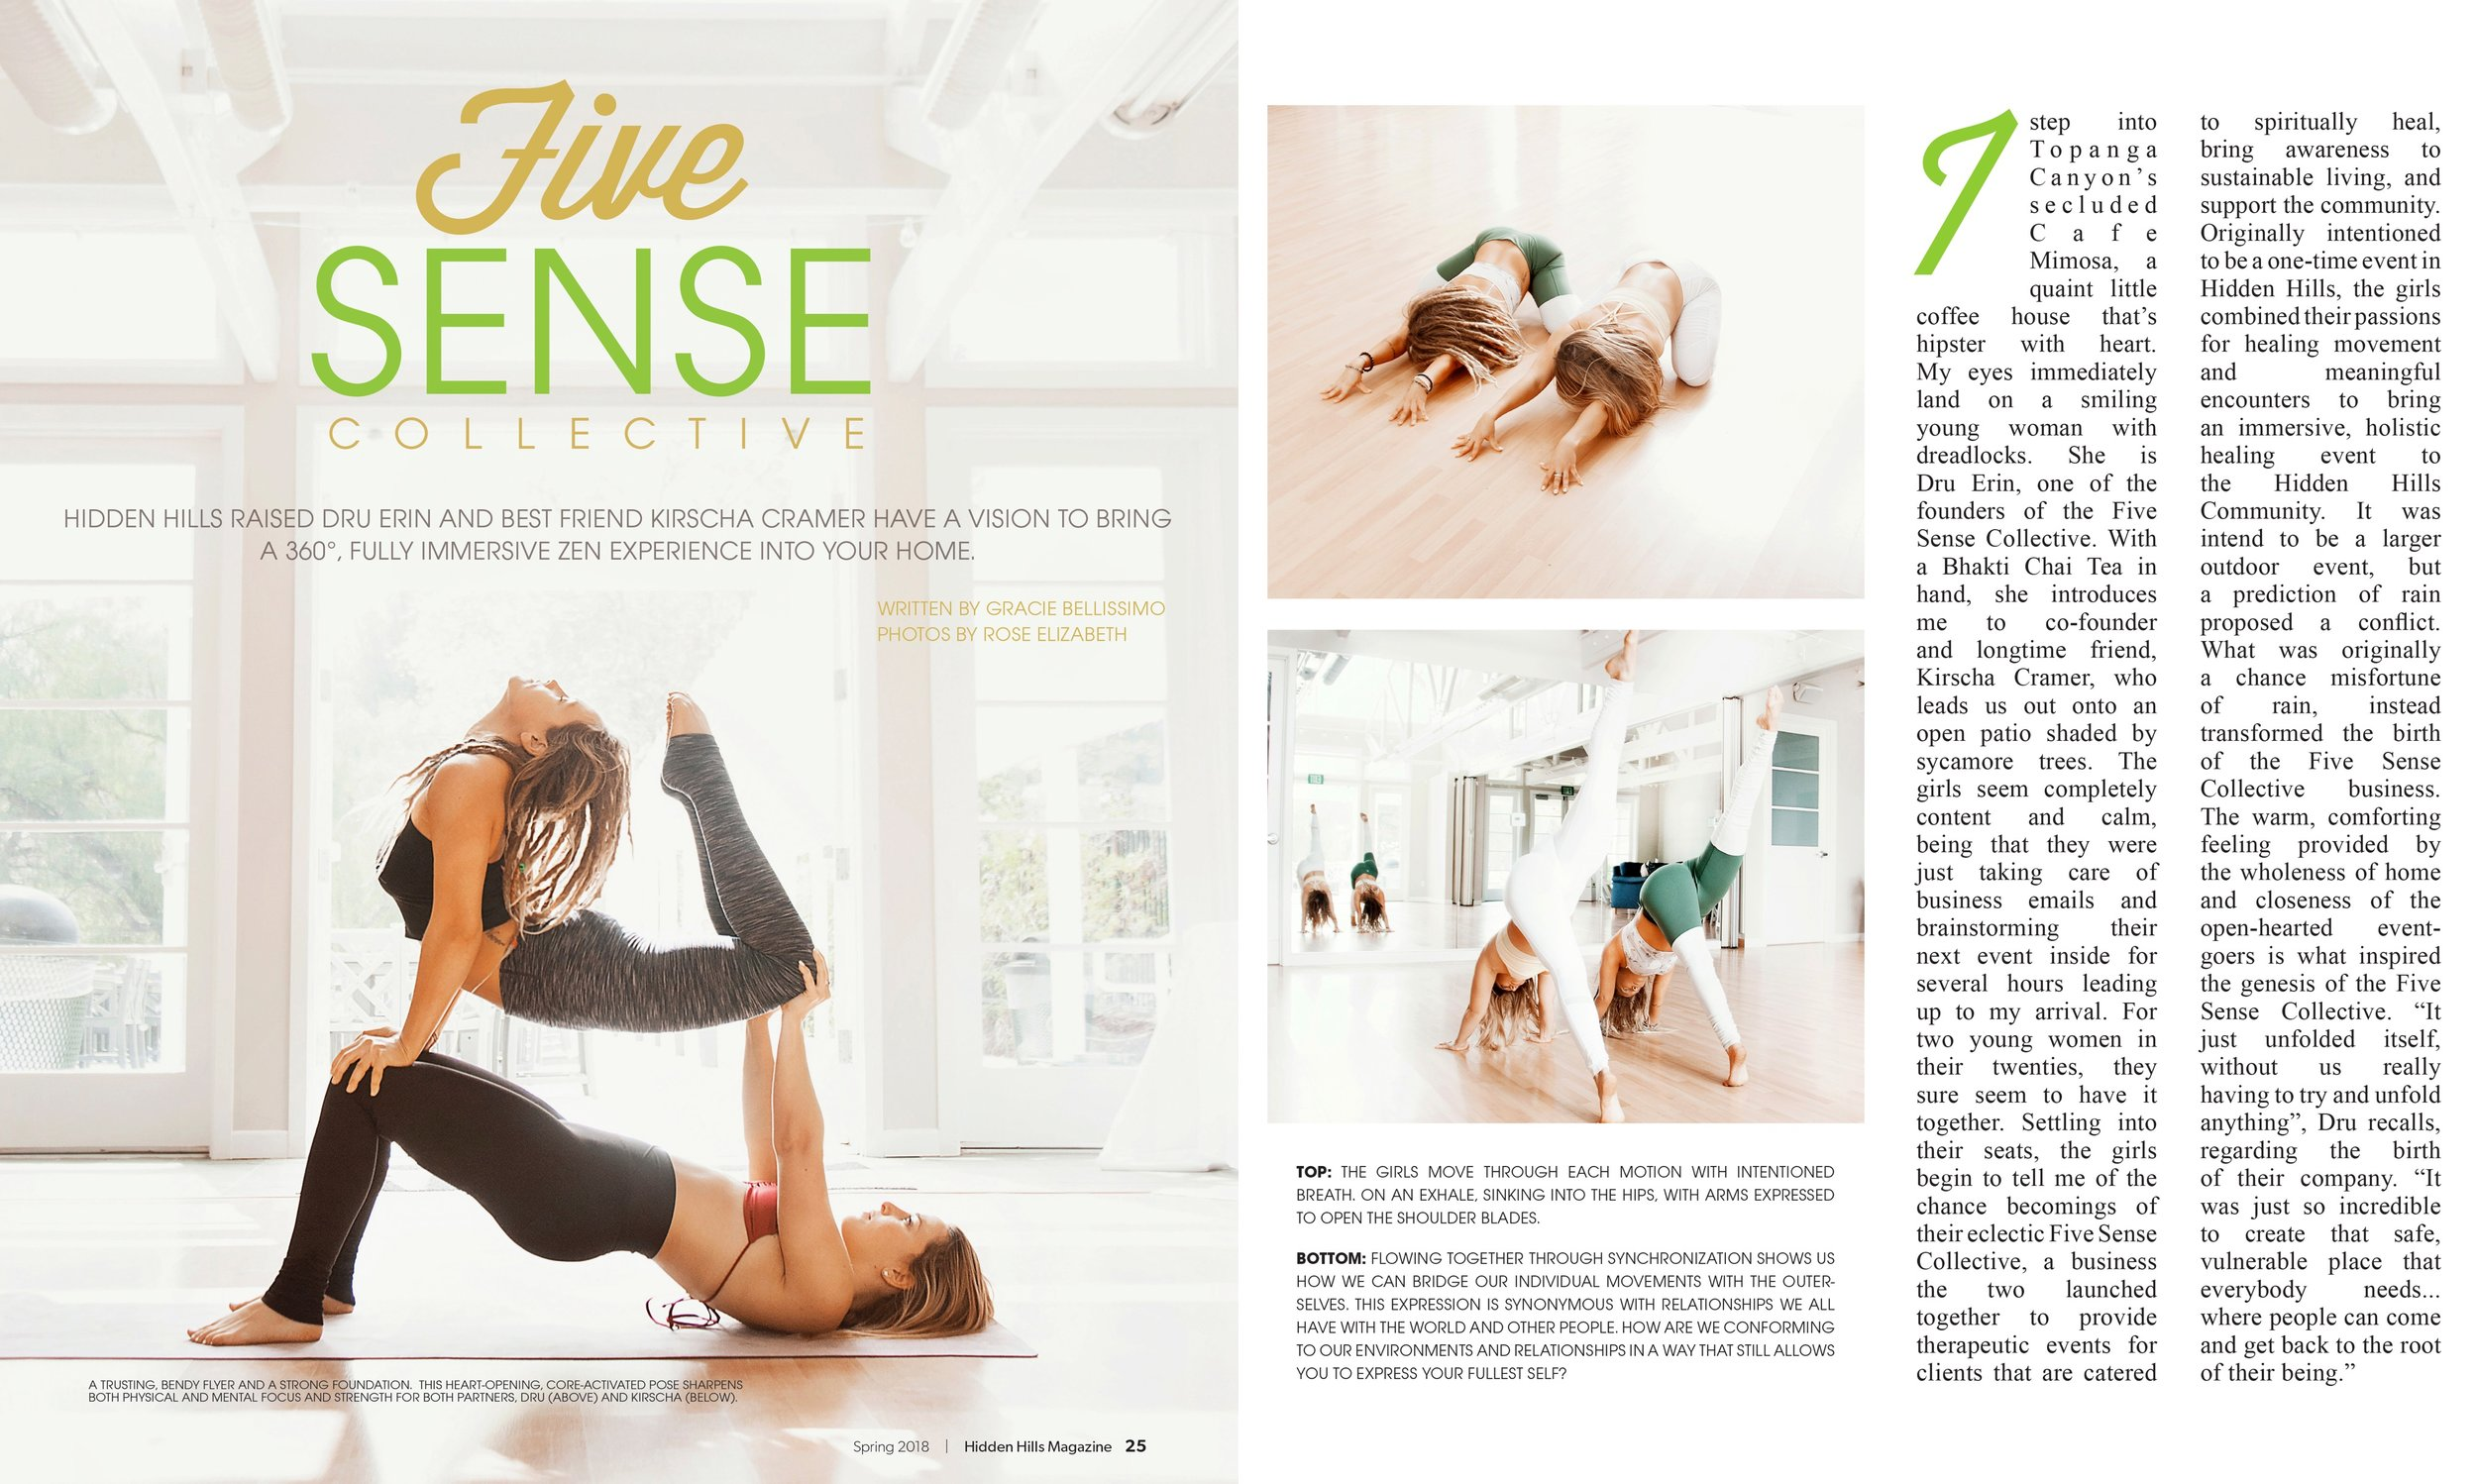 Hidden Hills Magazine Five Sense Collective page 1.jpeg